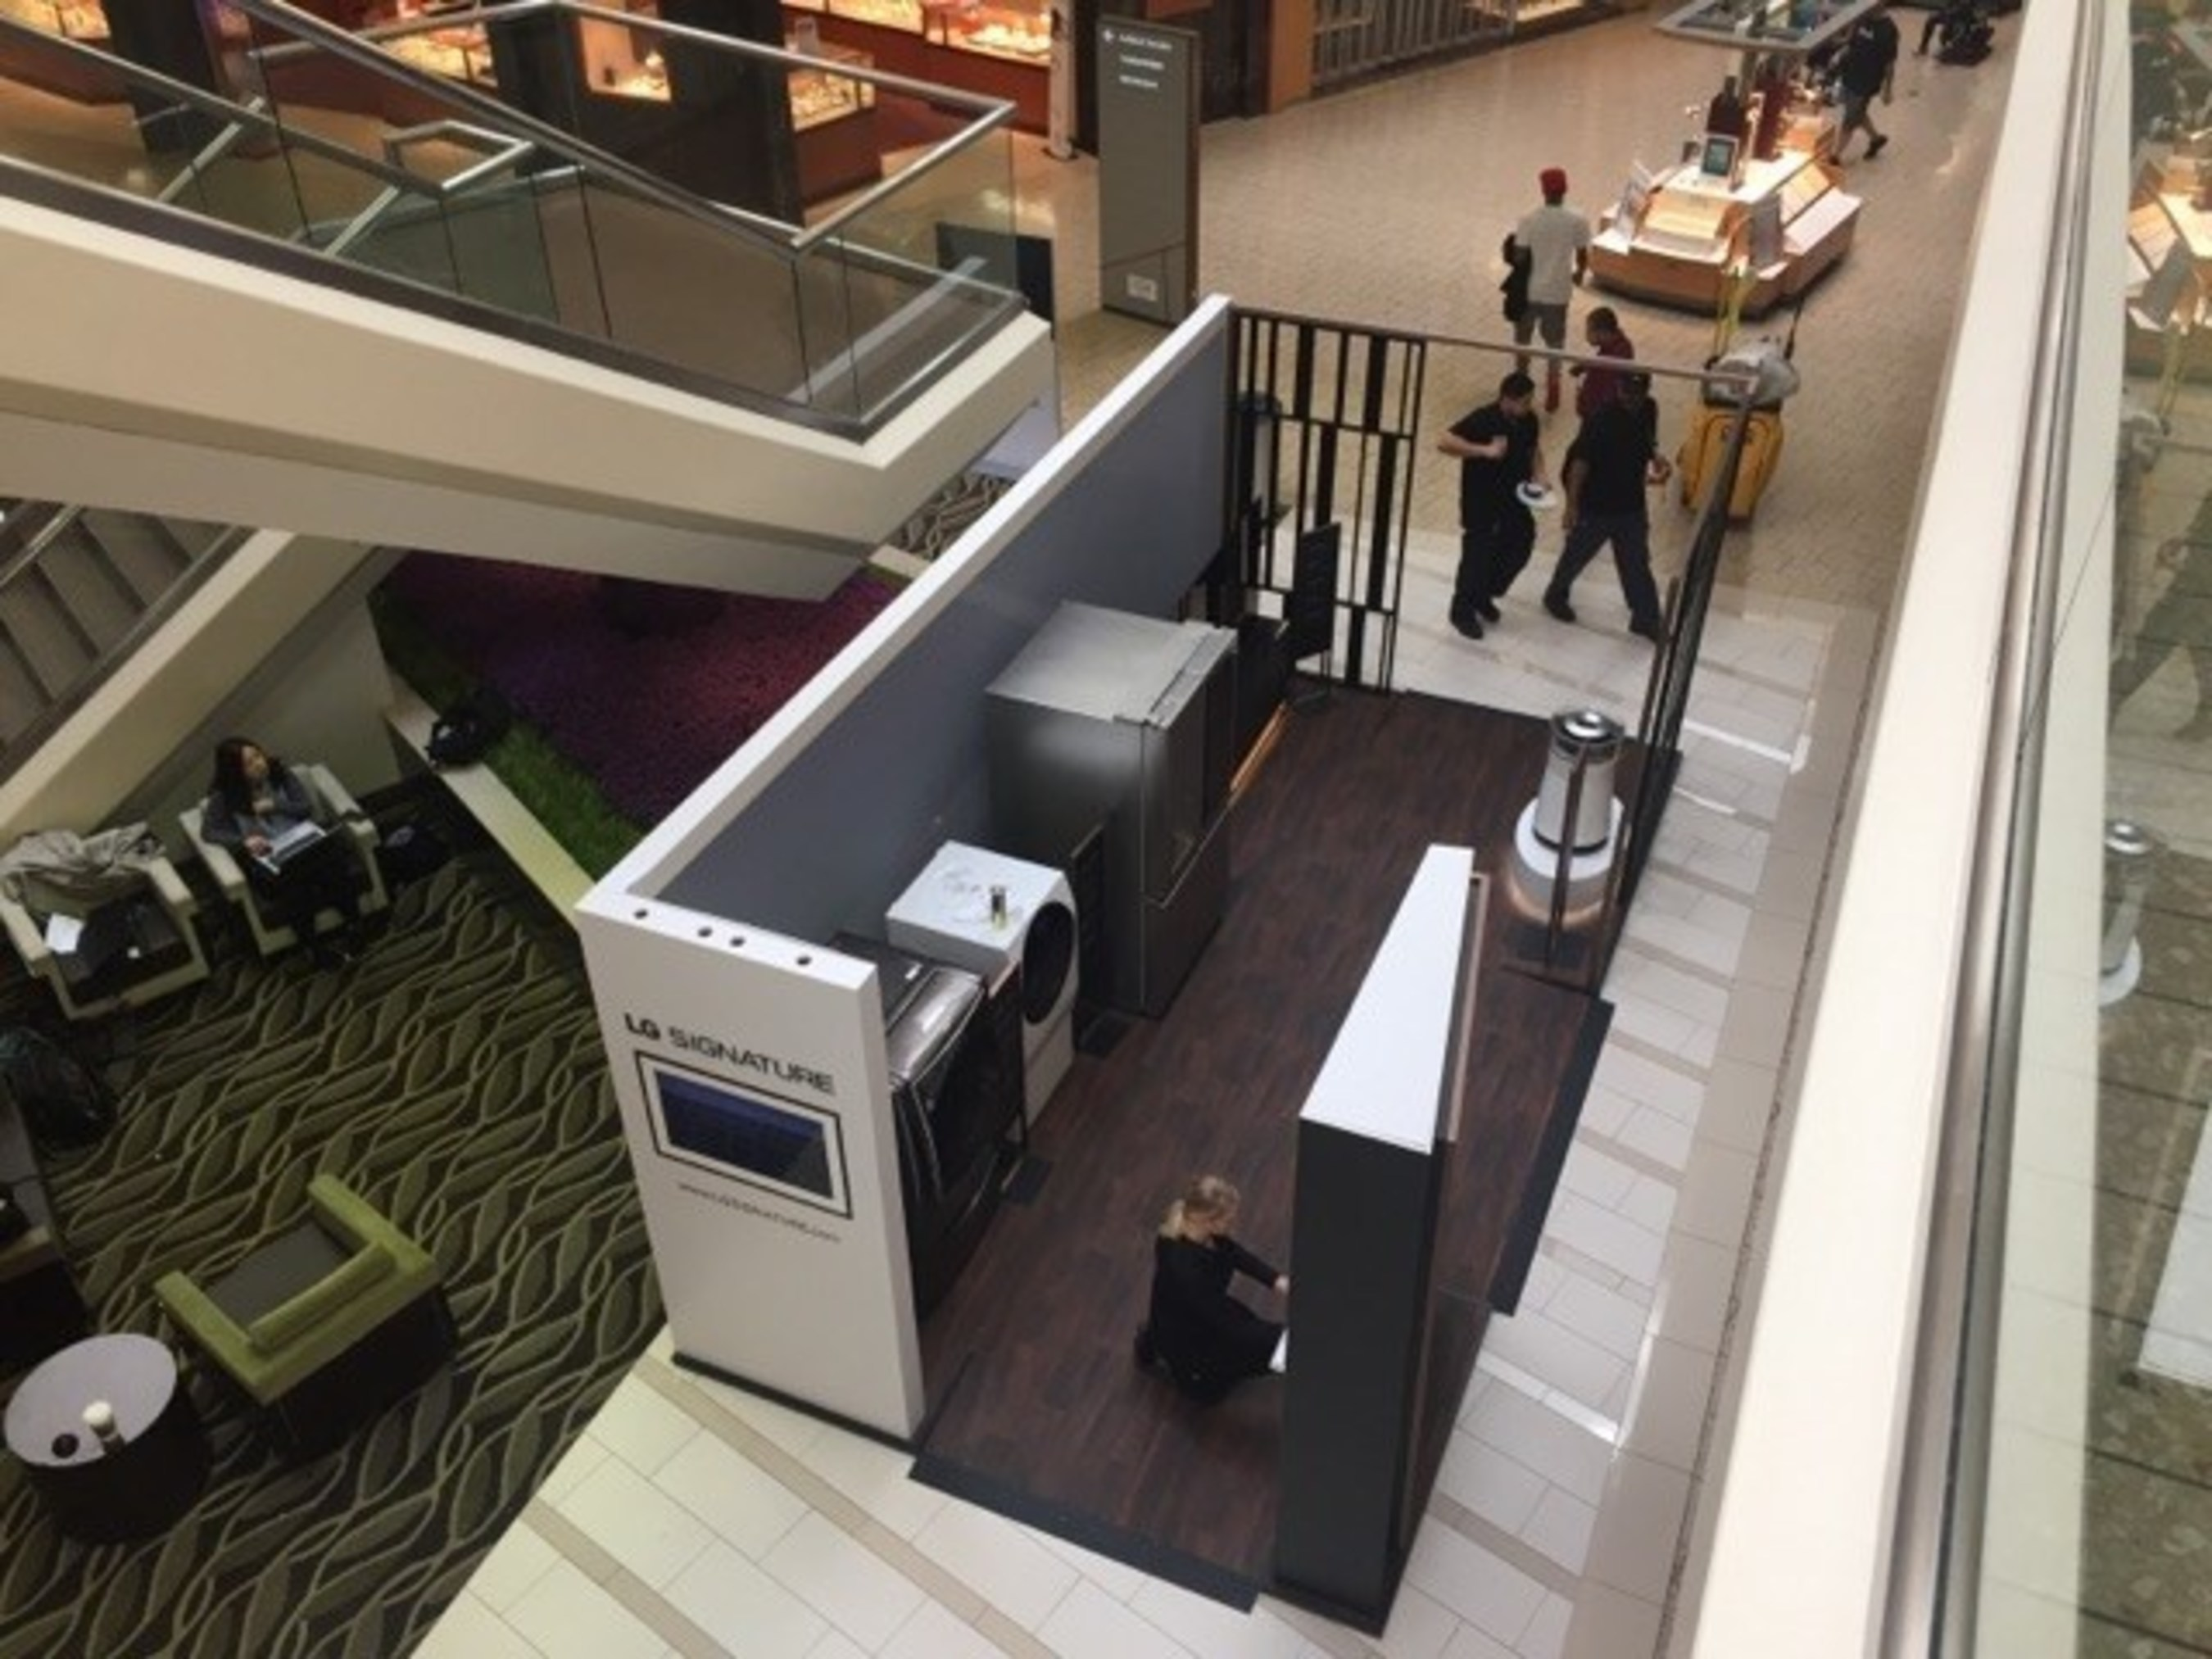 LG SIGNATURE 10-City Mall Tour